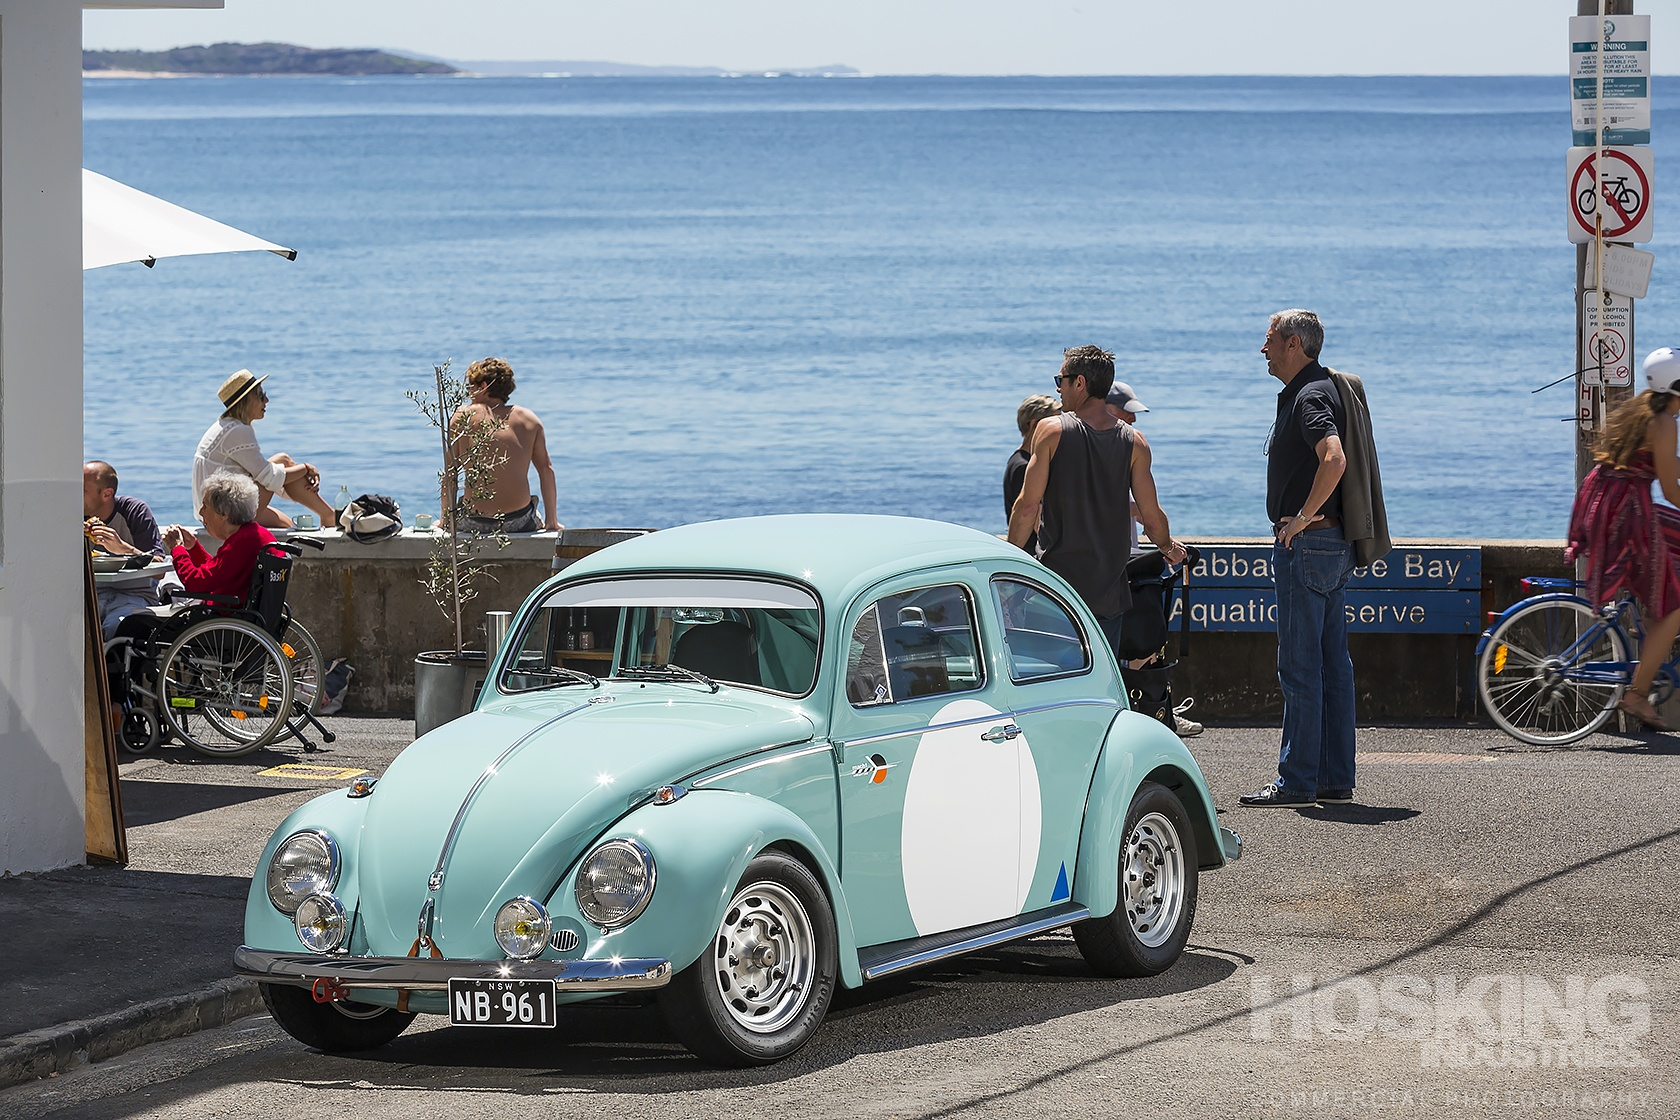 Nick Blunck's VW Beetle